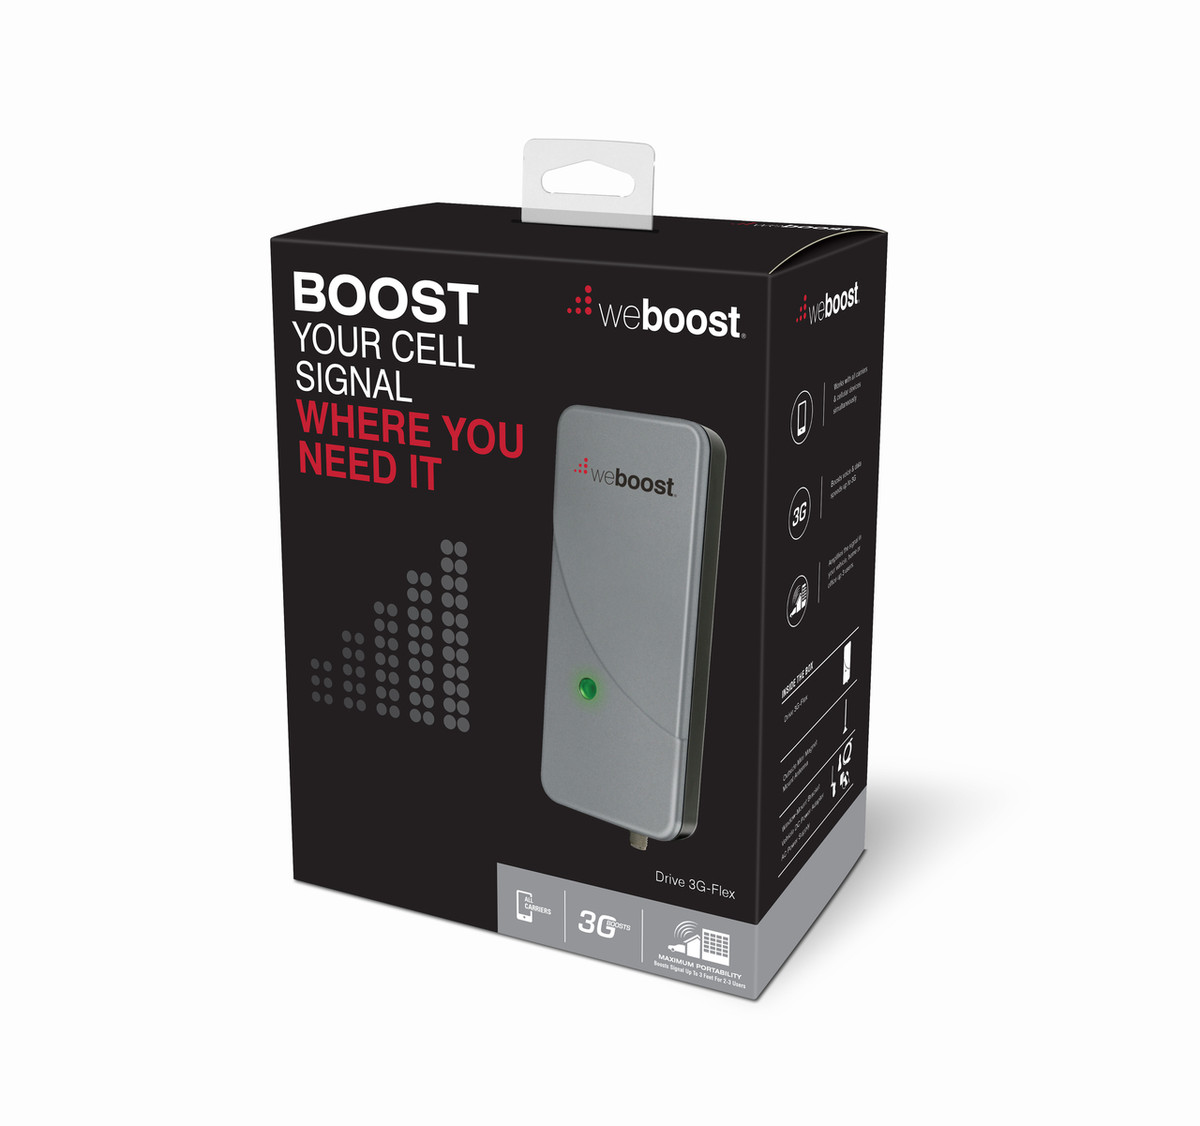 weBoost Drive 3G-Flex Cell Phone Signal Booster   470113 Box View